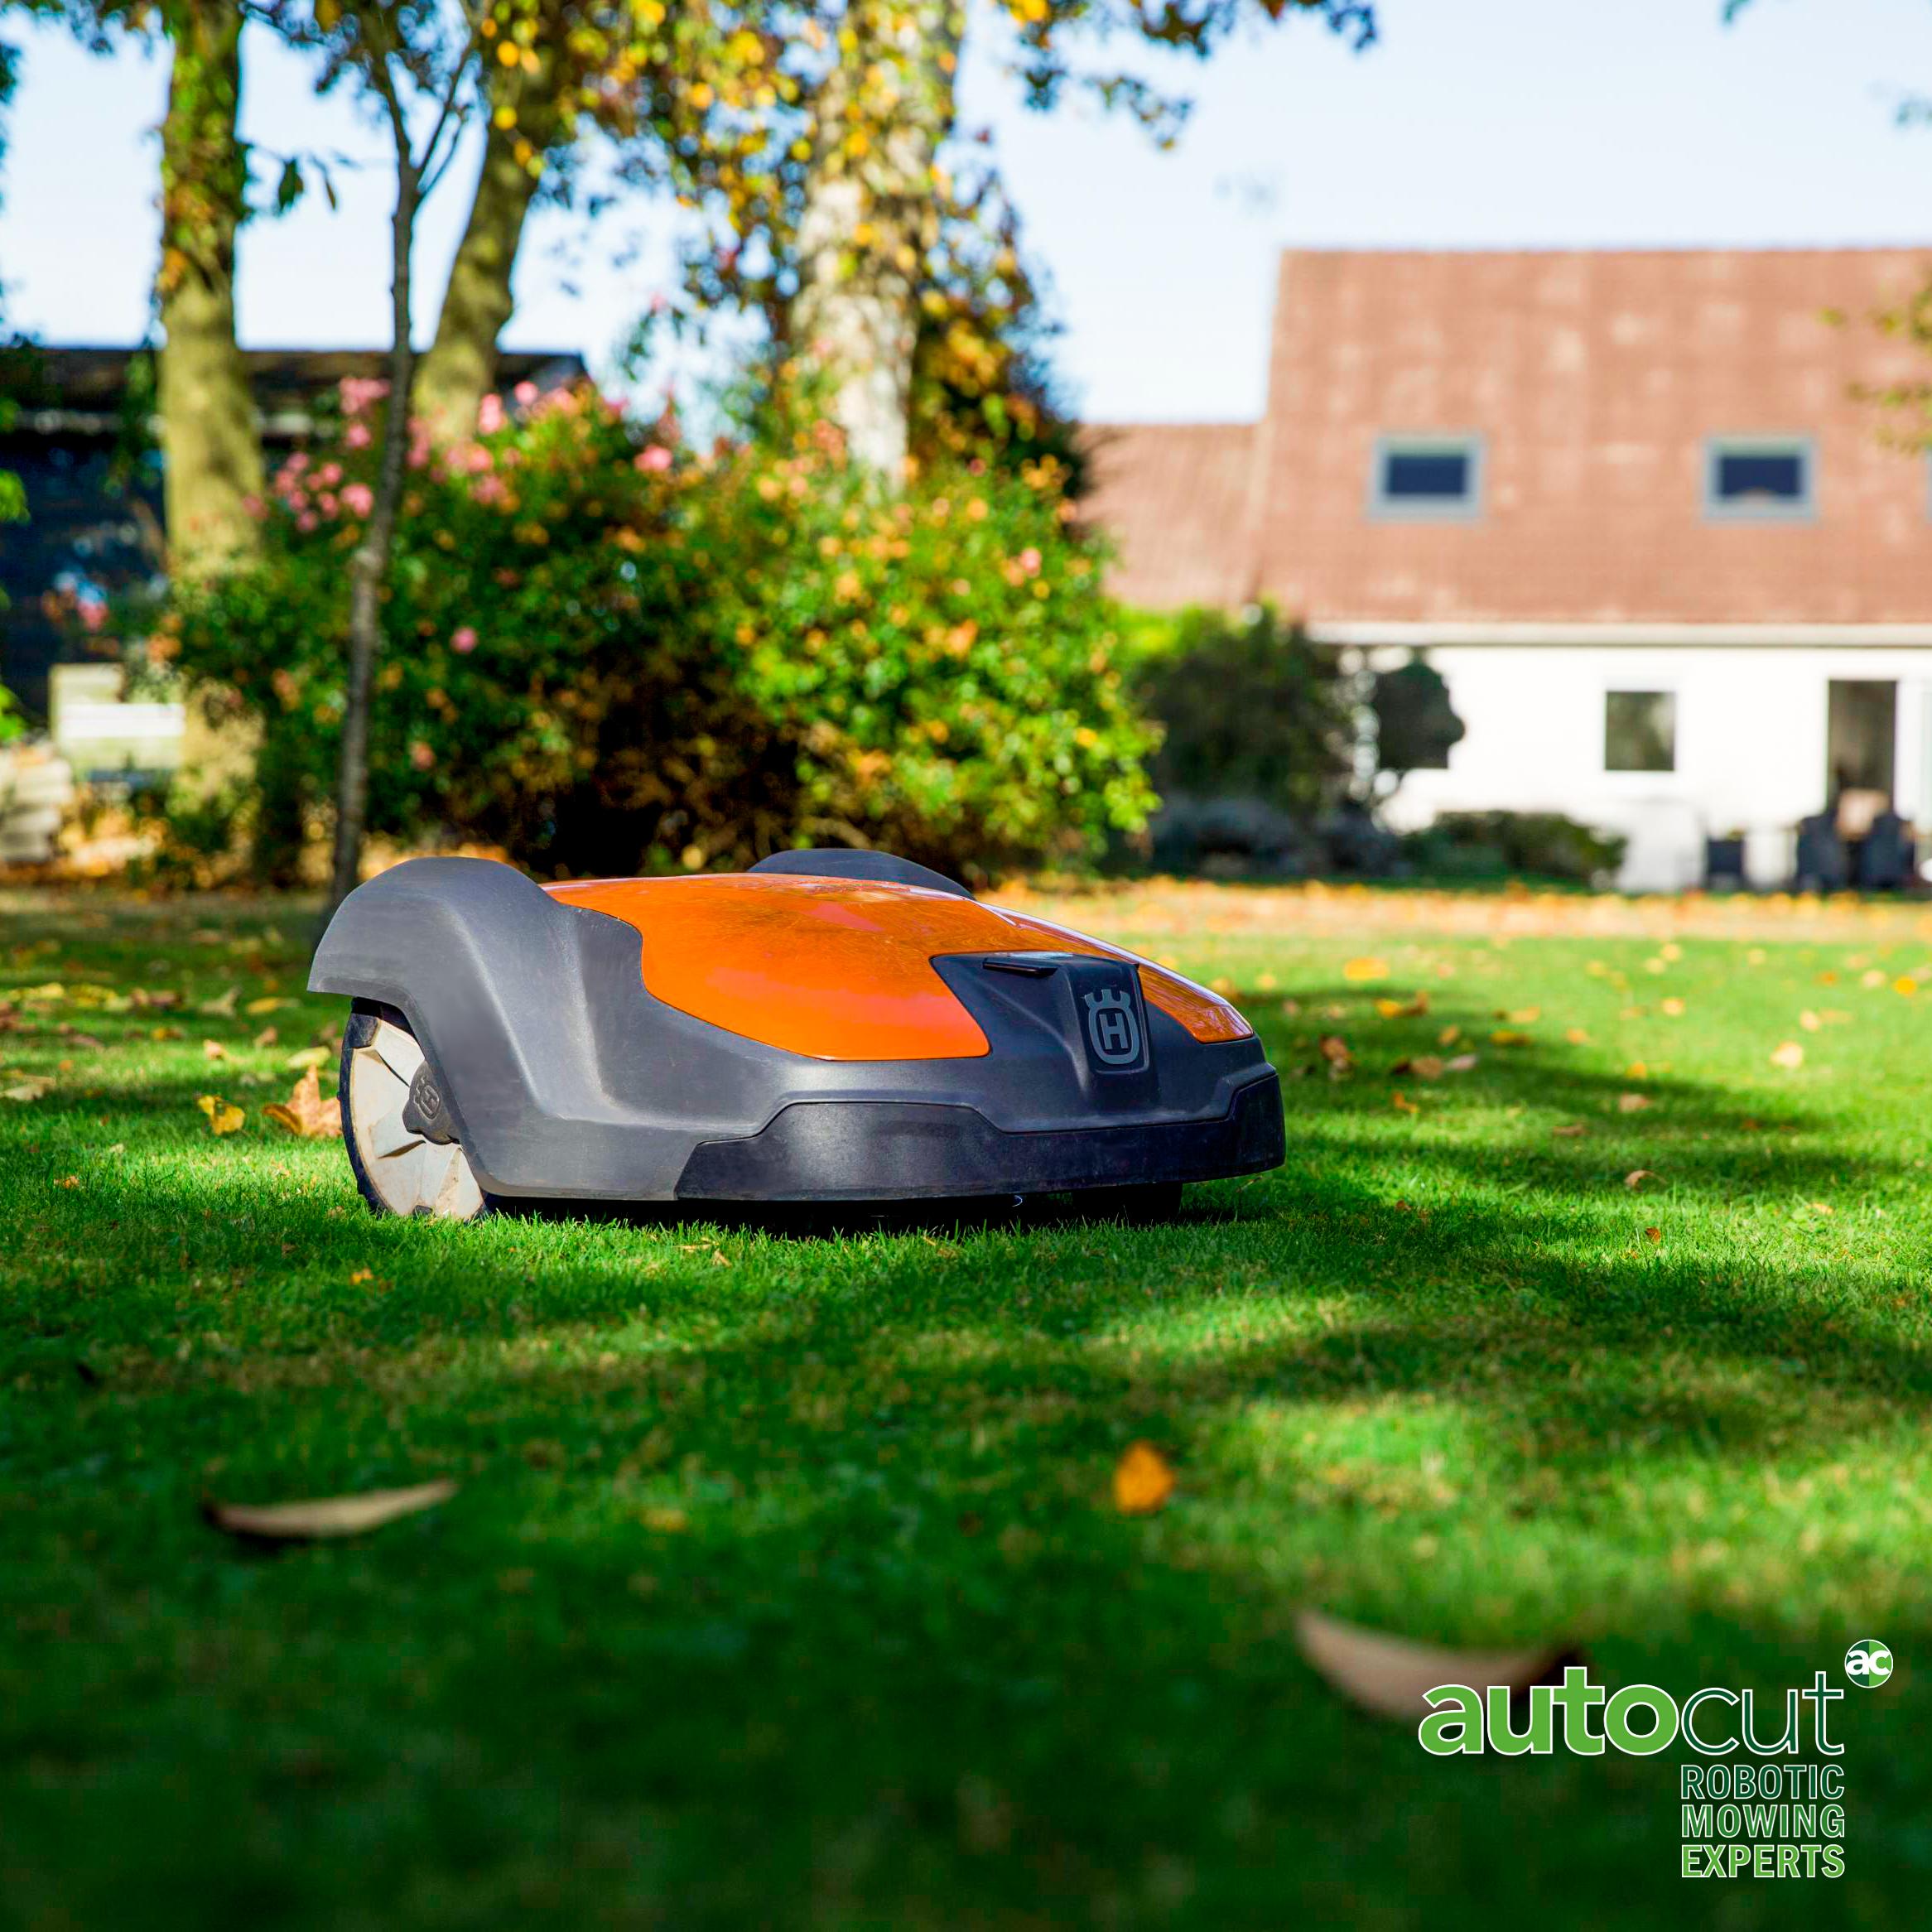 Meet the Mower: Automower® 520